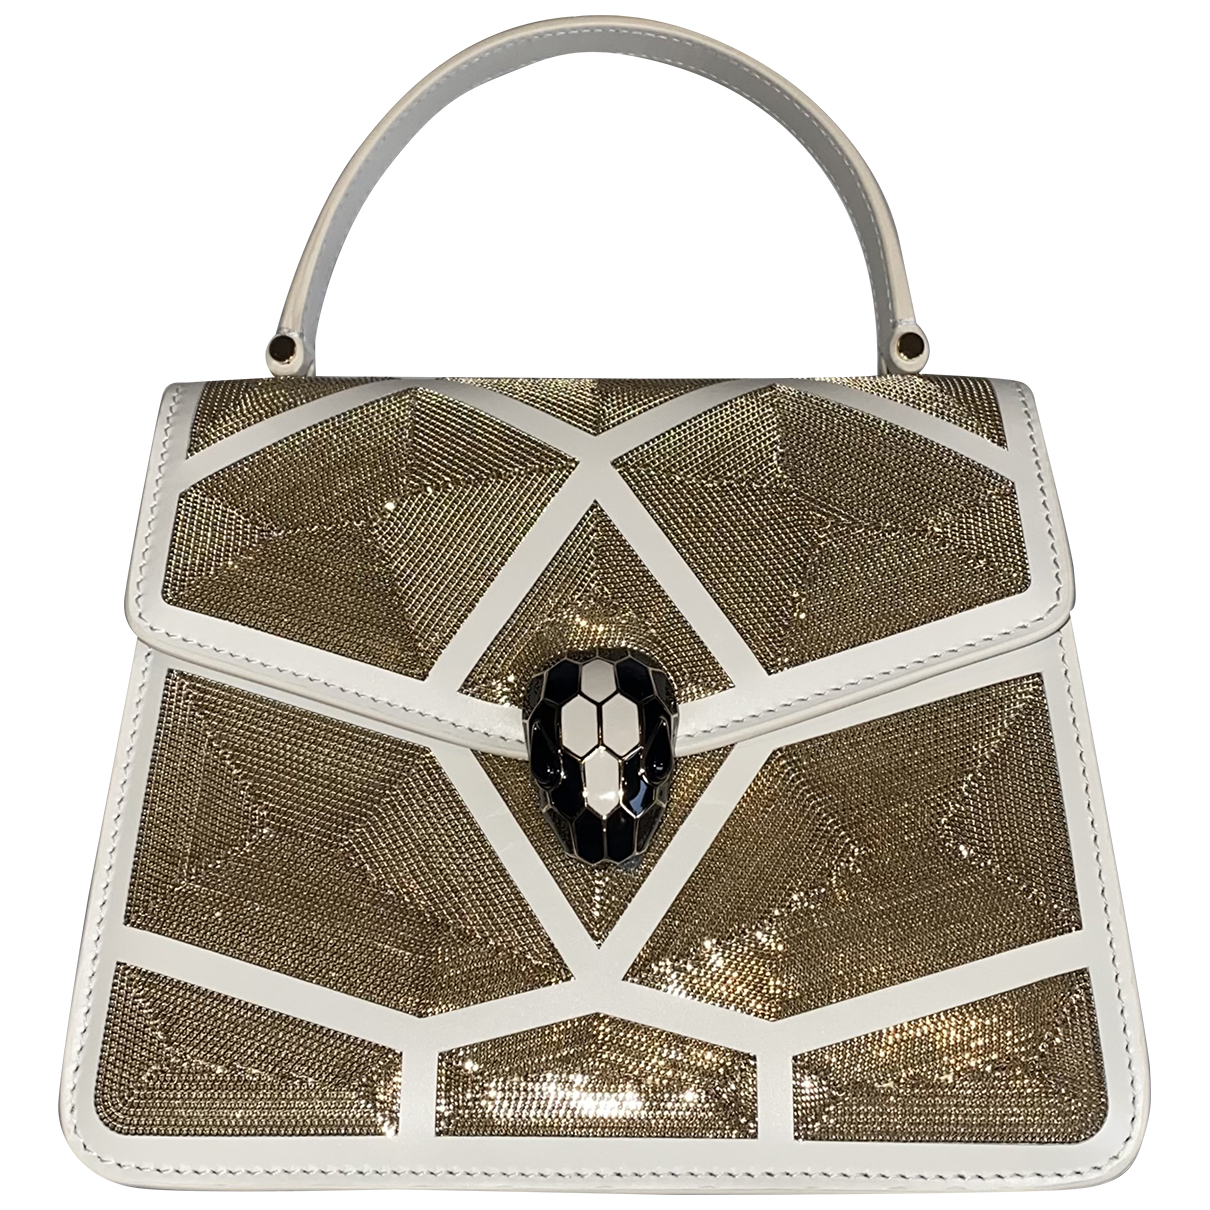 Bvlgari Serpenti Metallic Leather handbag for Women N